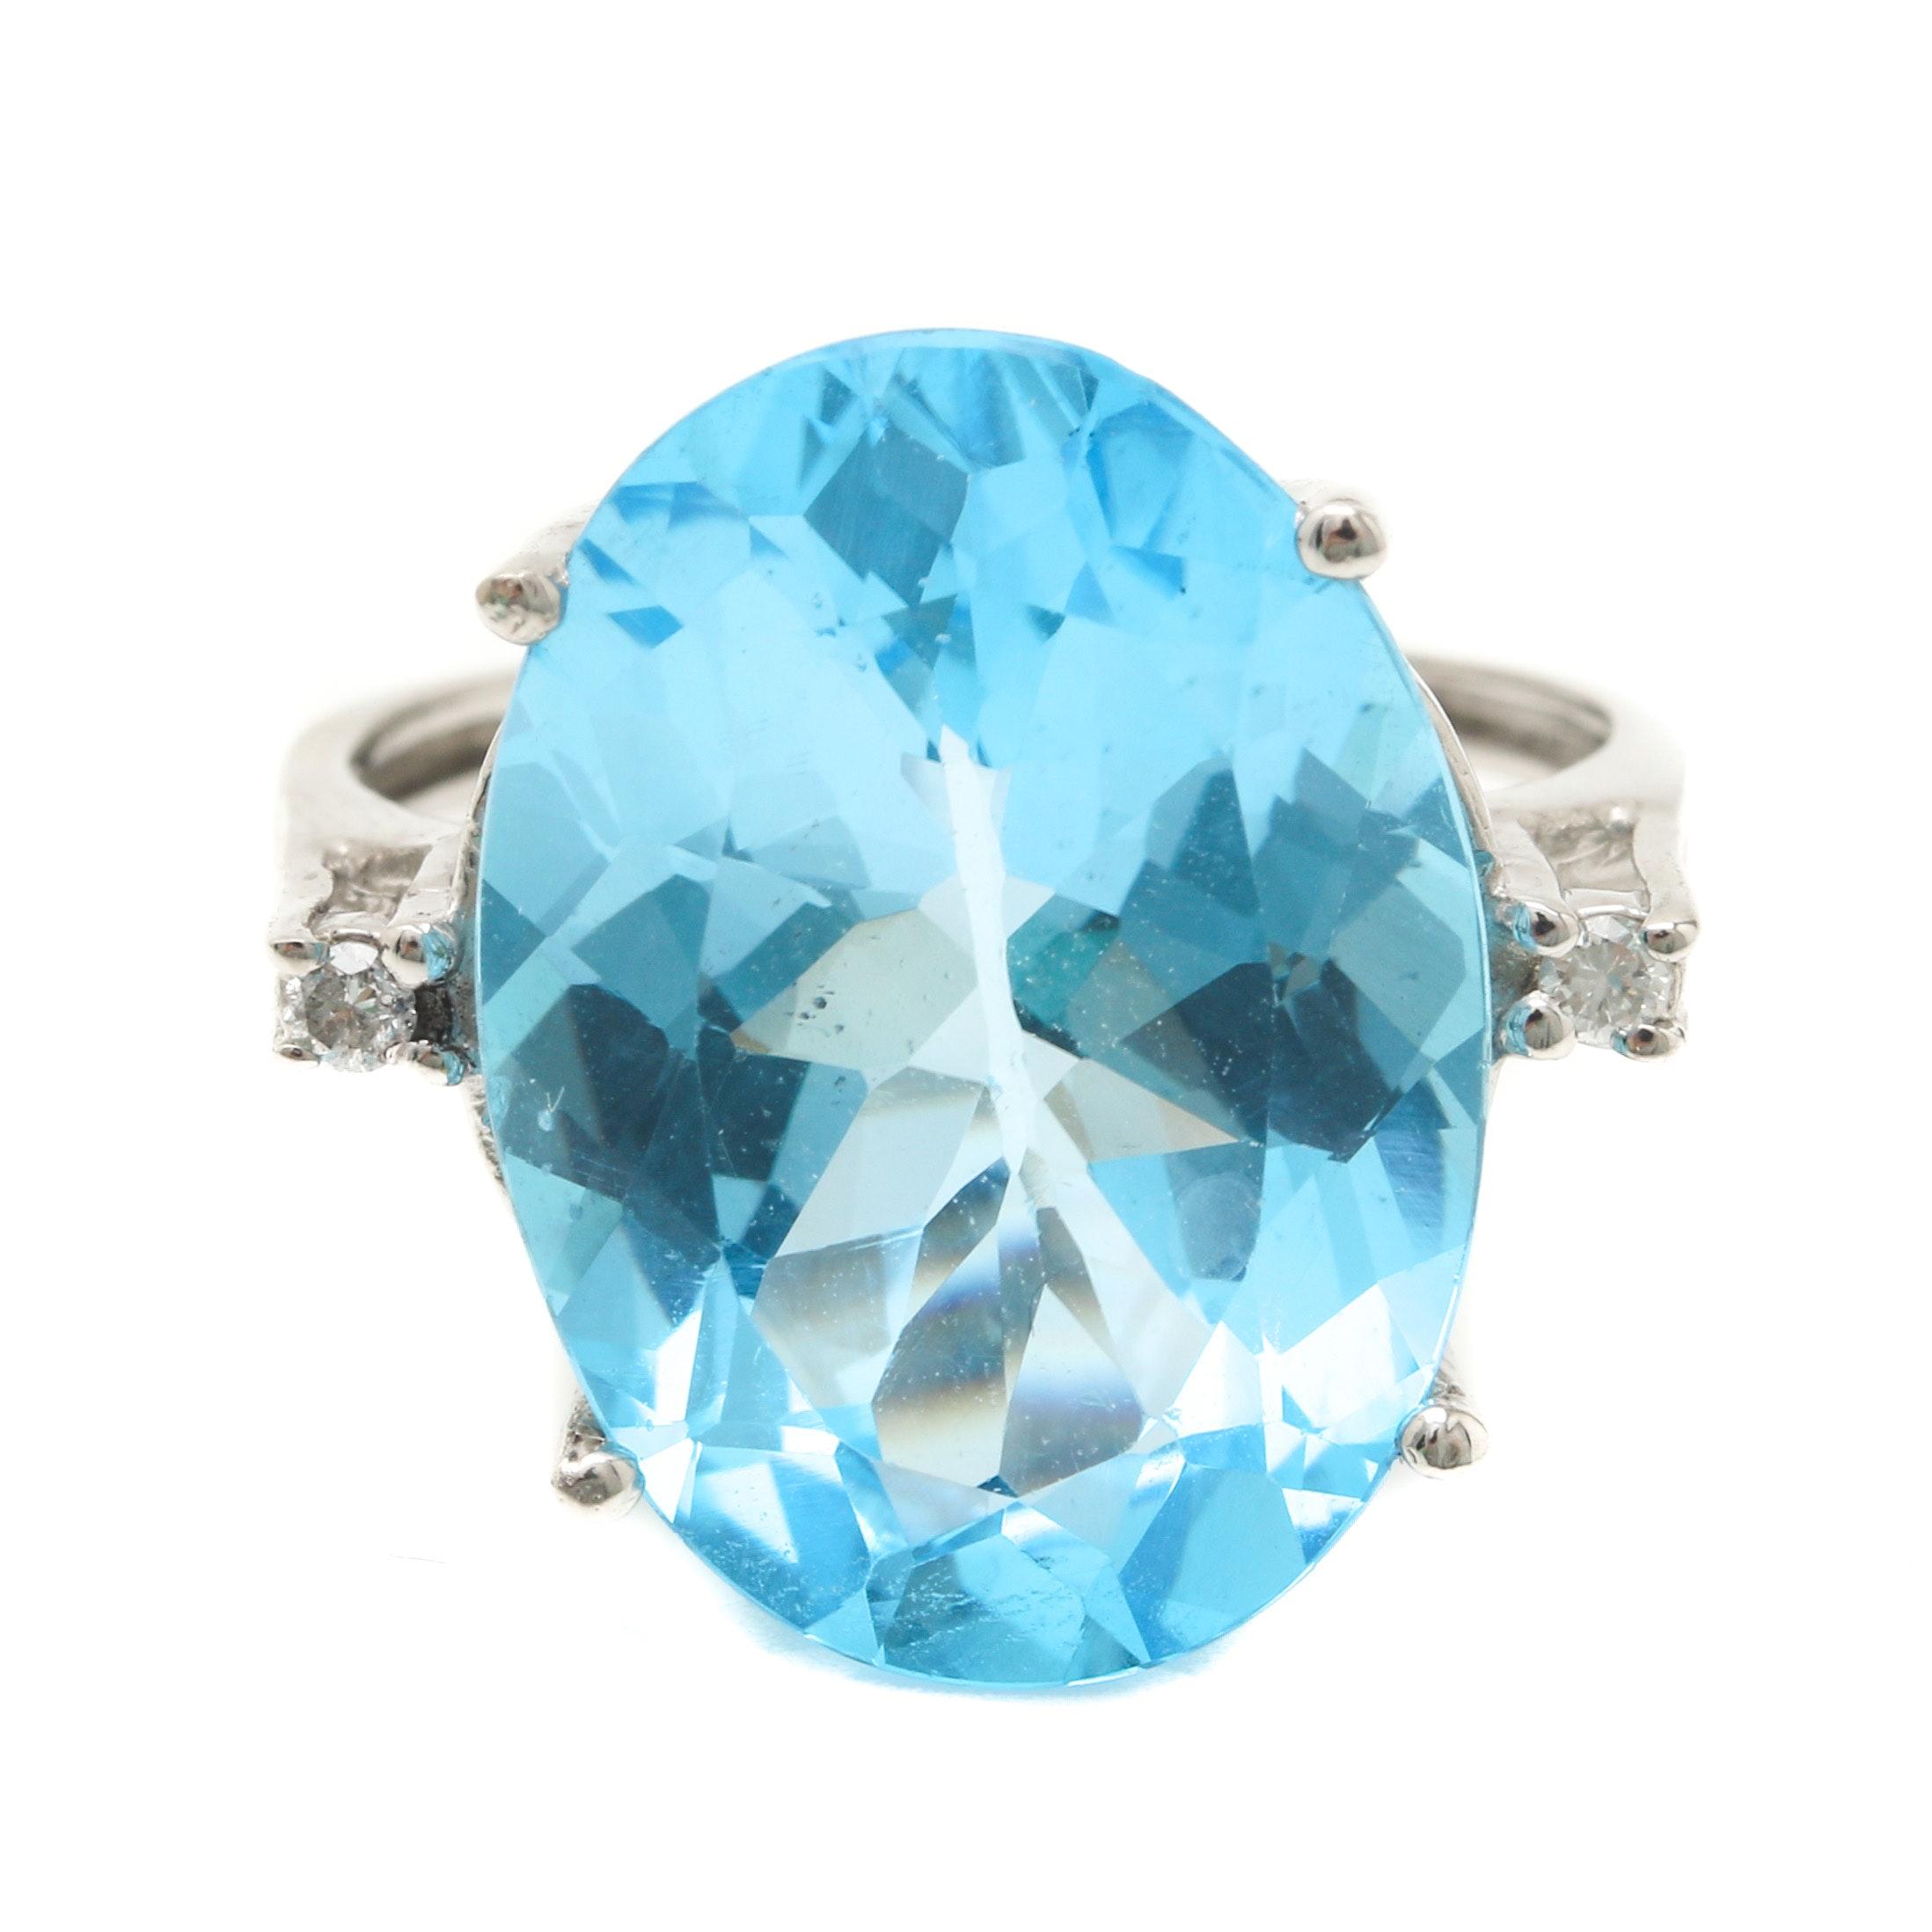 10K White Gold Blue Topaz and Diamond Cocktail Ring